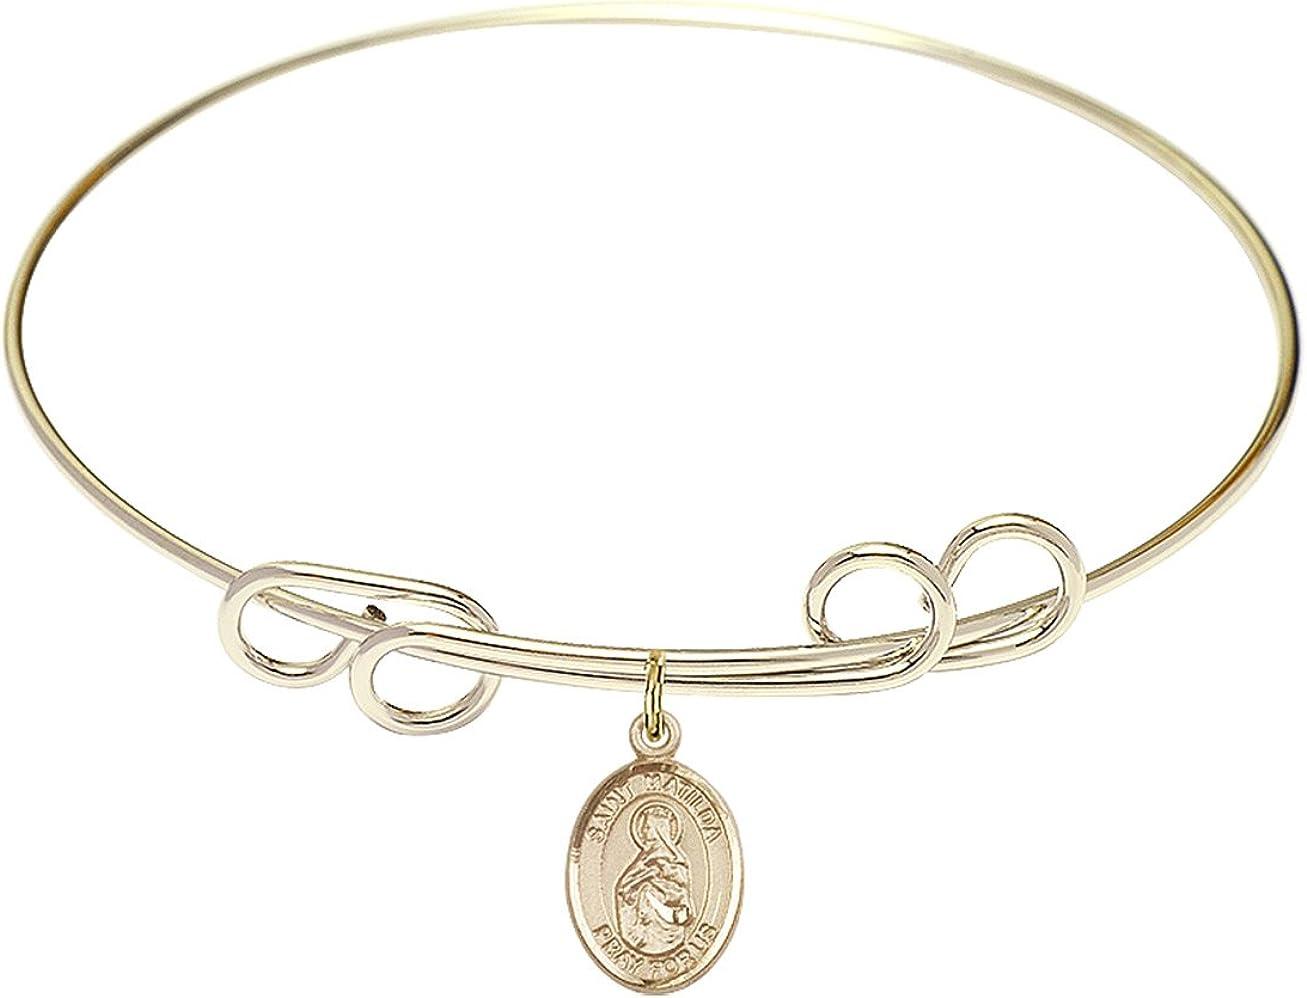 DiamondJewelryNY Double Loop Bangle Bracelet with a St. Matilda Charm.